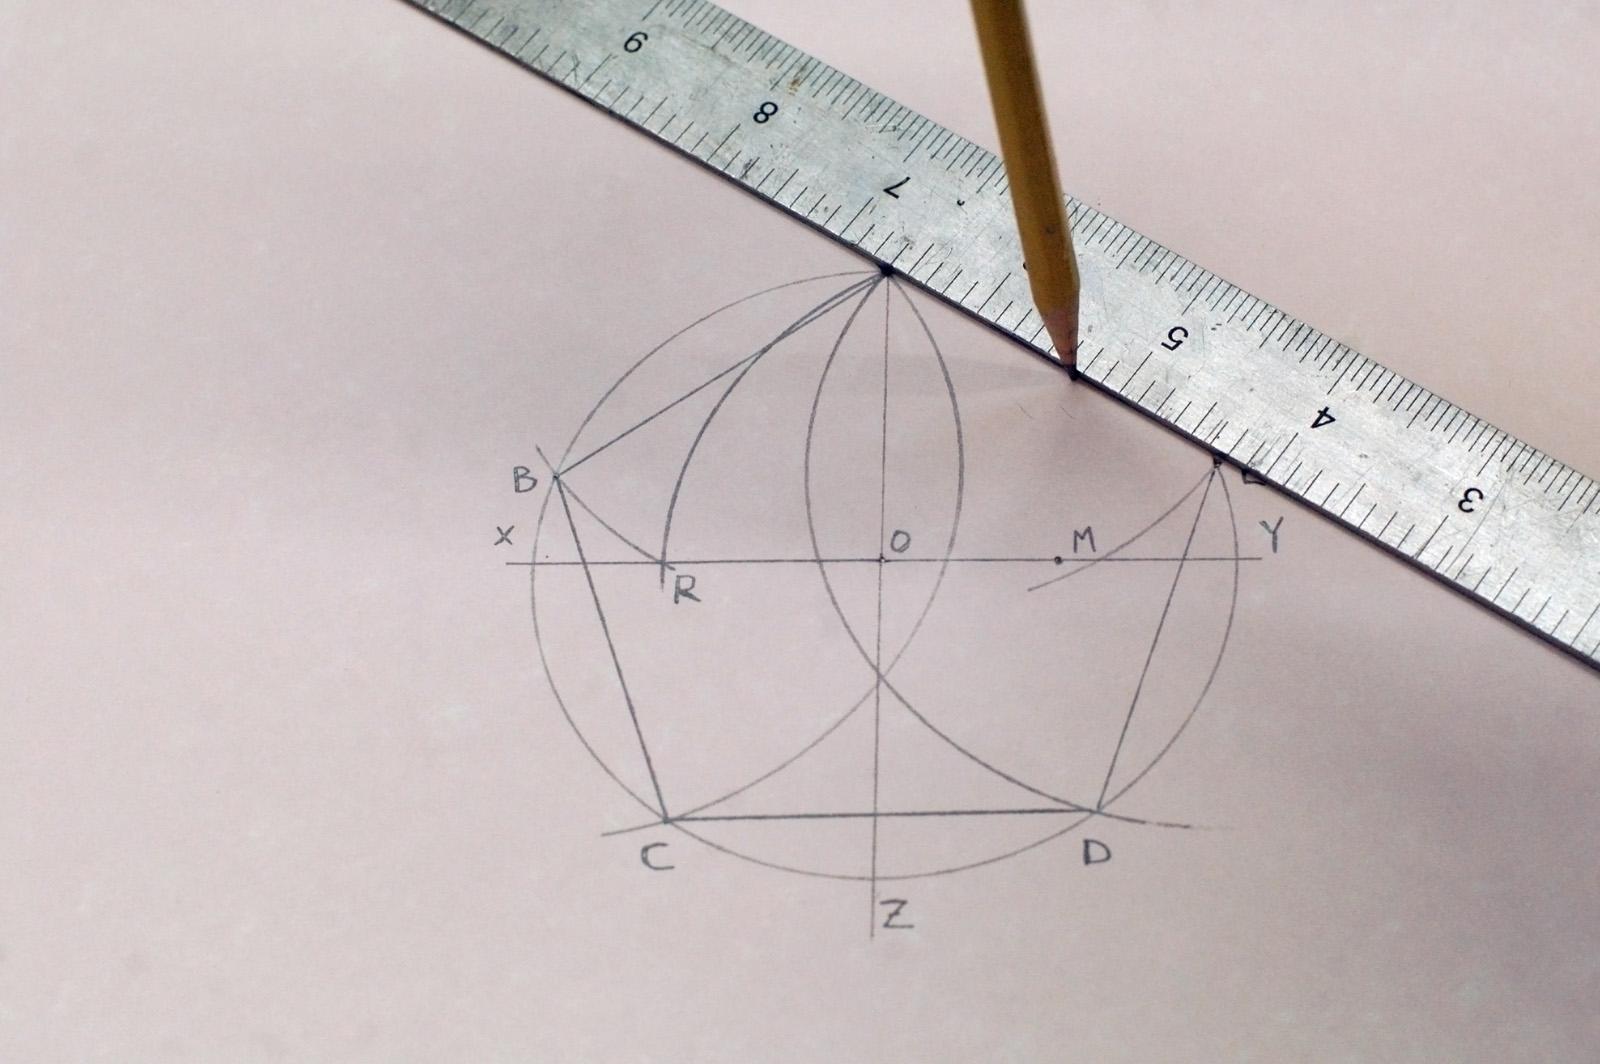 Drawn stare pentagon Compass a to a a